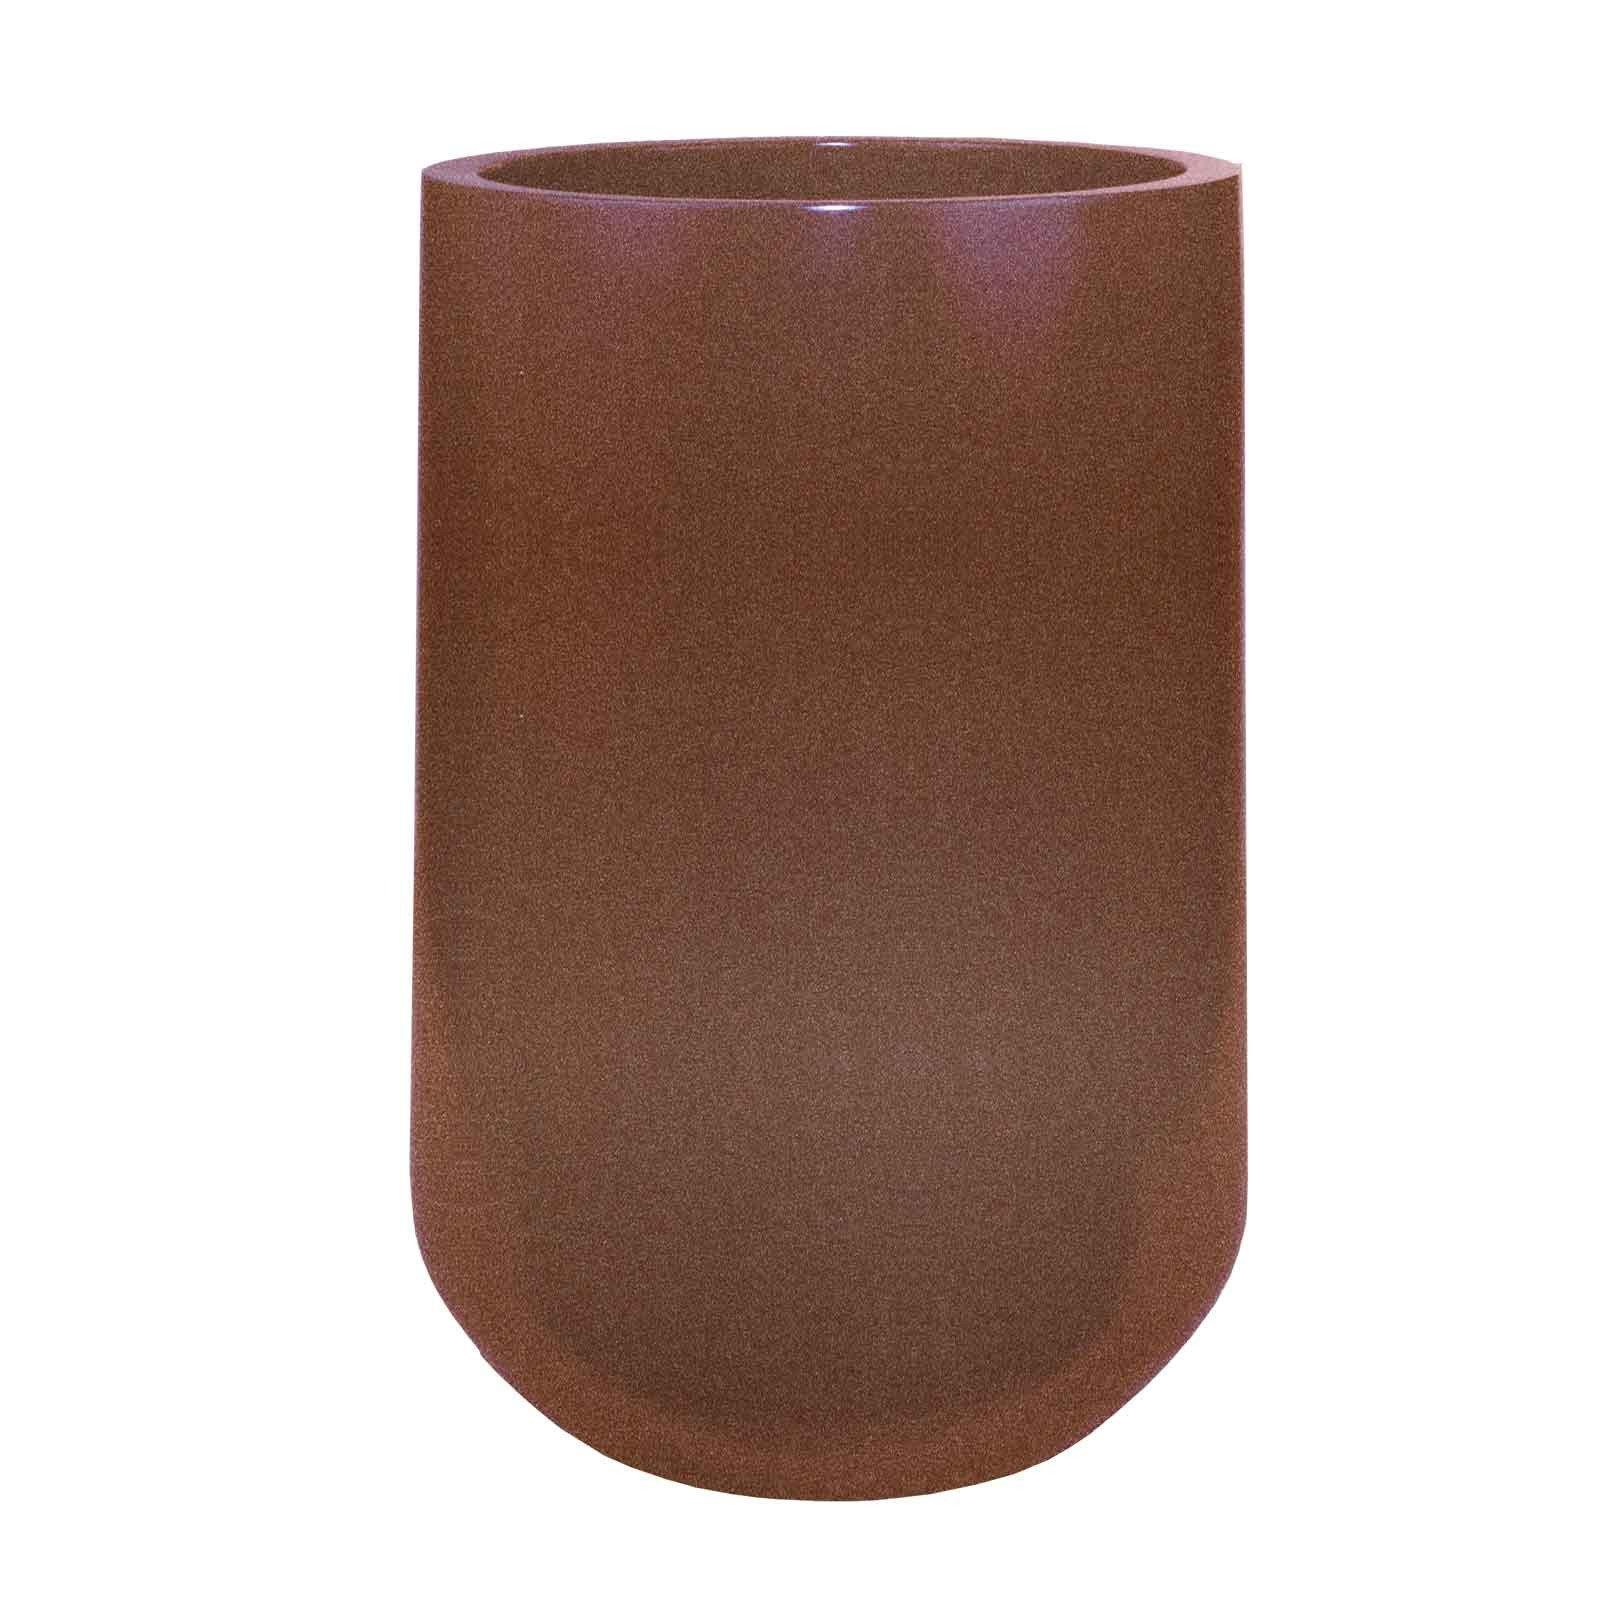 Vase Planter - Fiberglass - 15'/20'/23' Tall